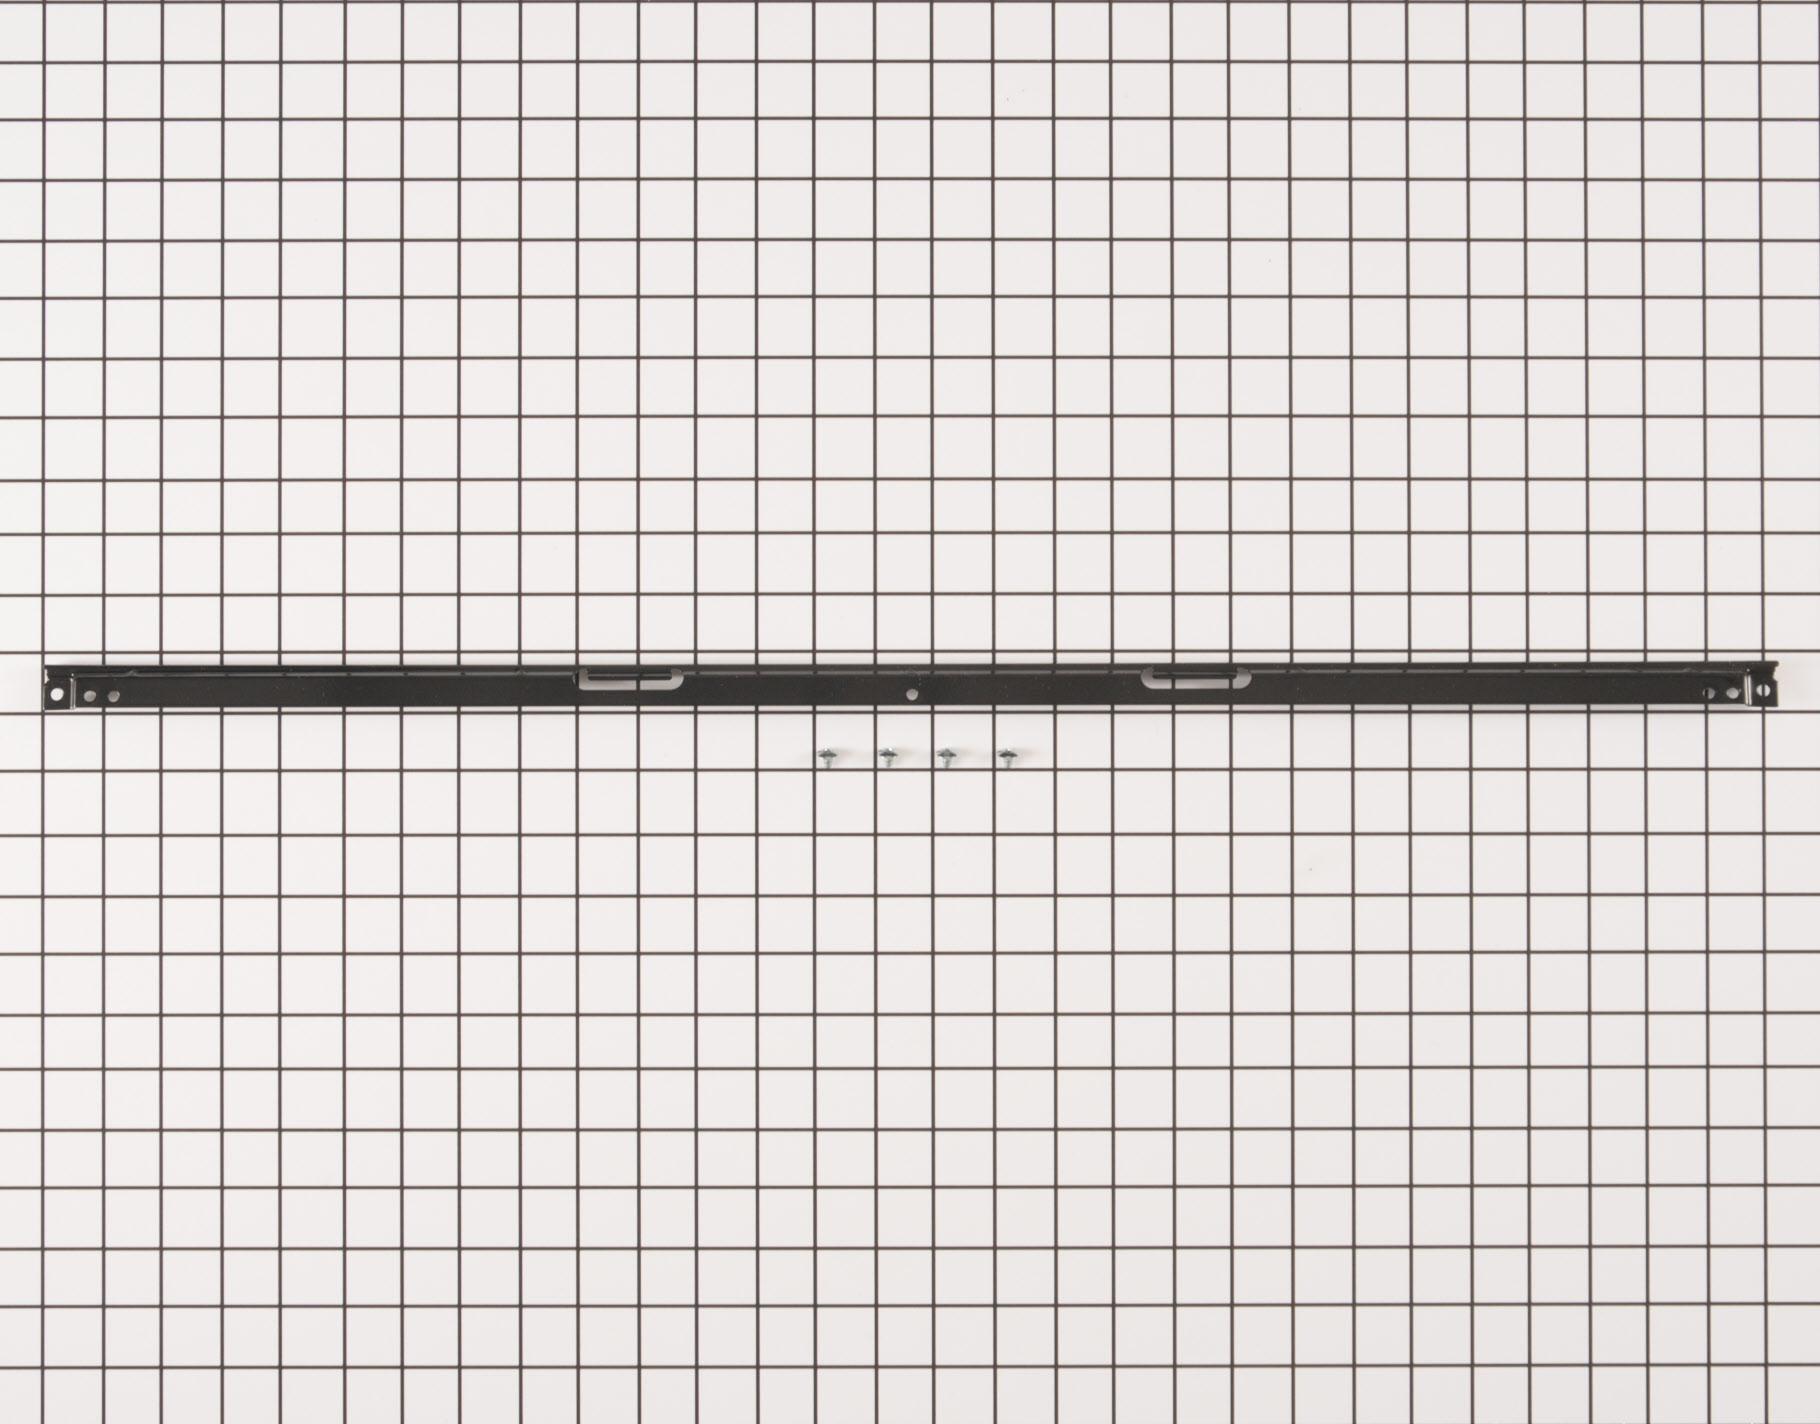 Maytag Range/Stove/Oven Part # WP8523177 - Bottom Trim